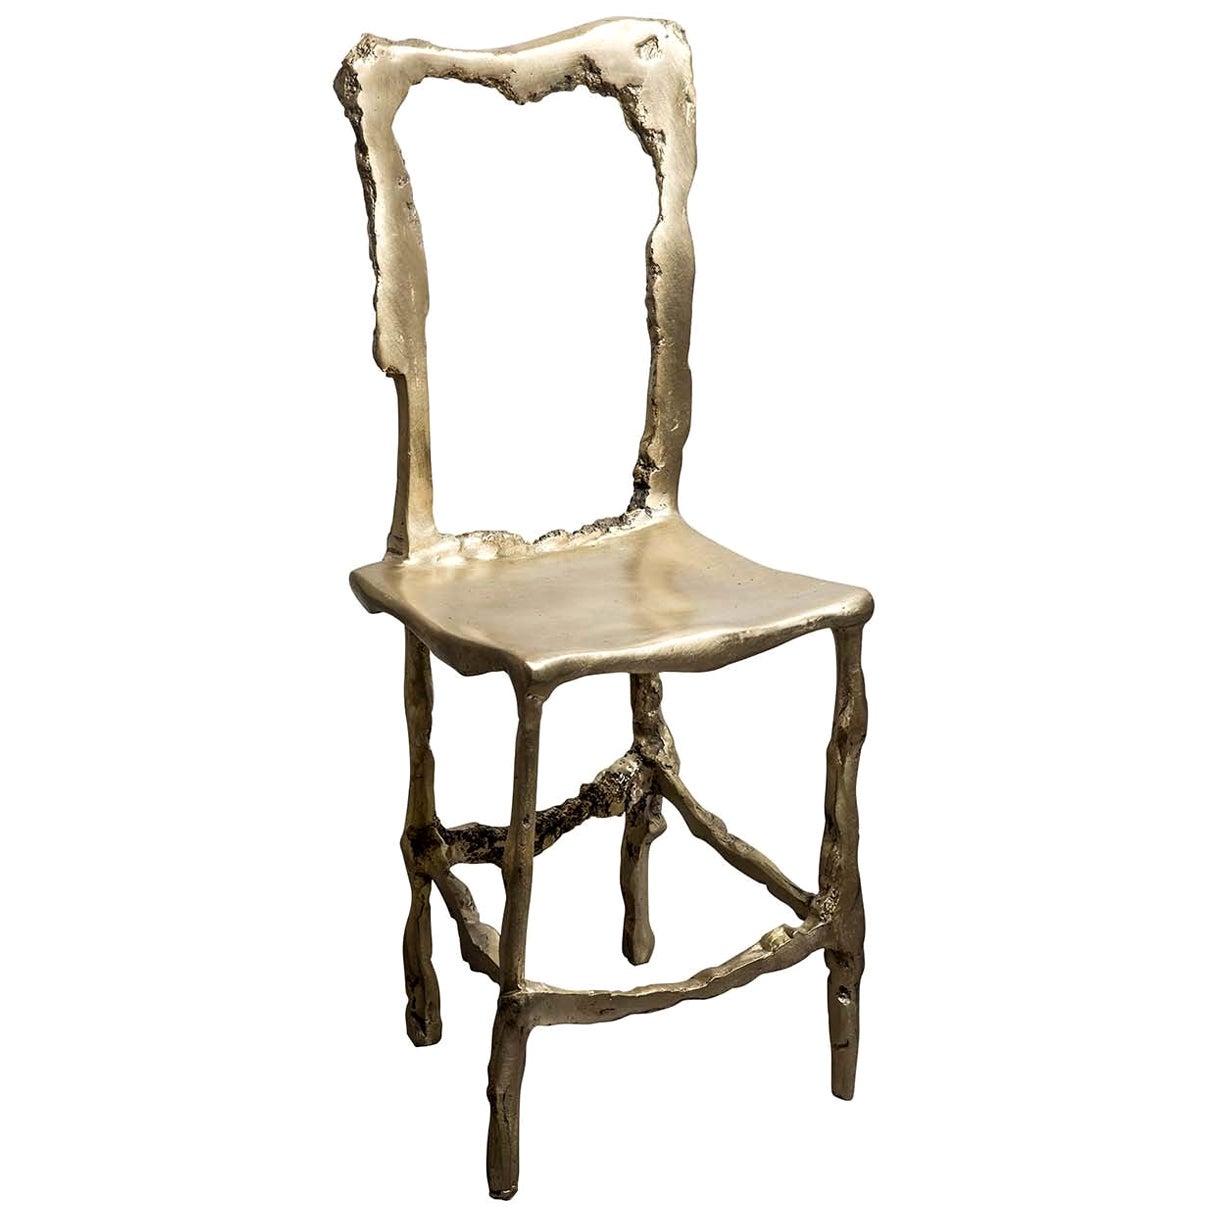 Cast Brass Scultura Decorative Chair